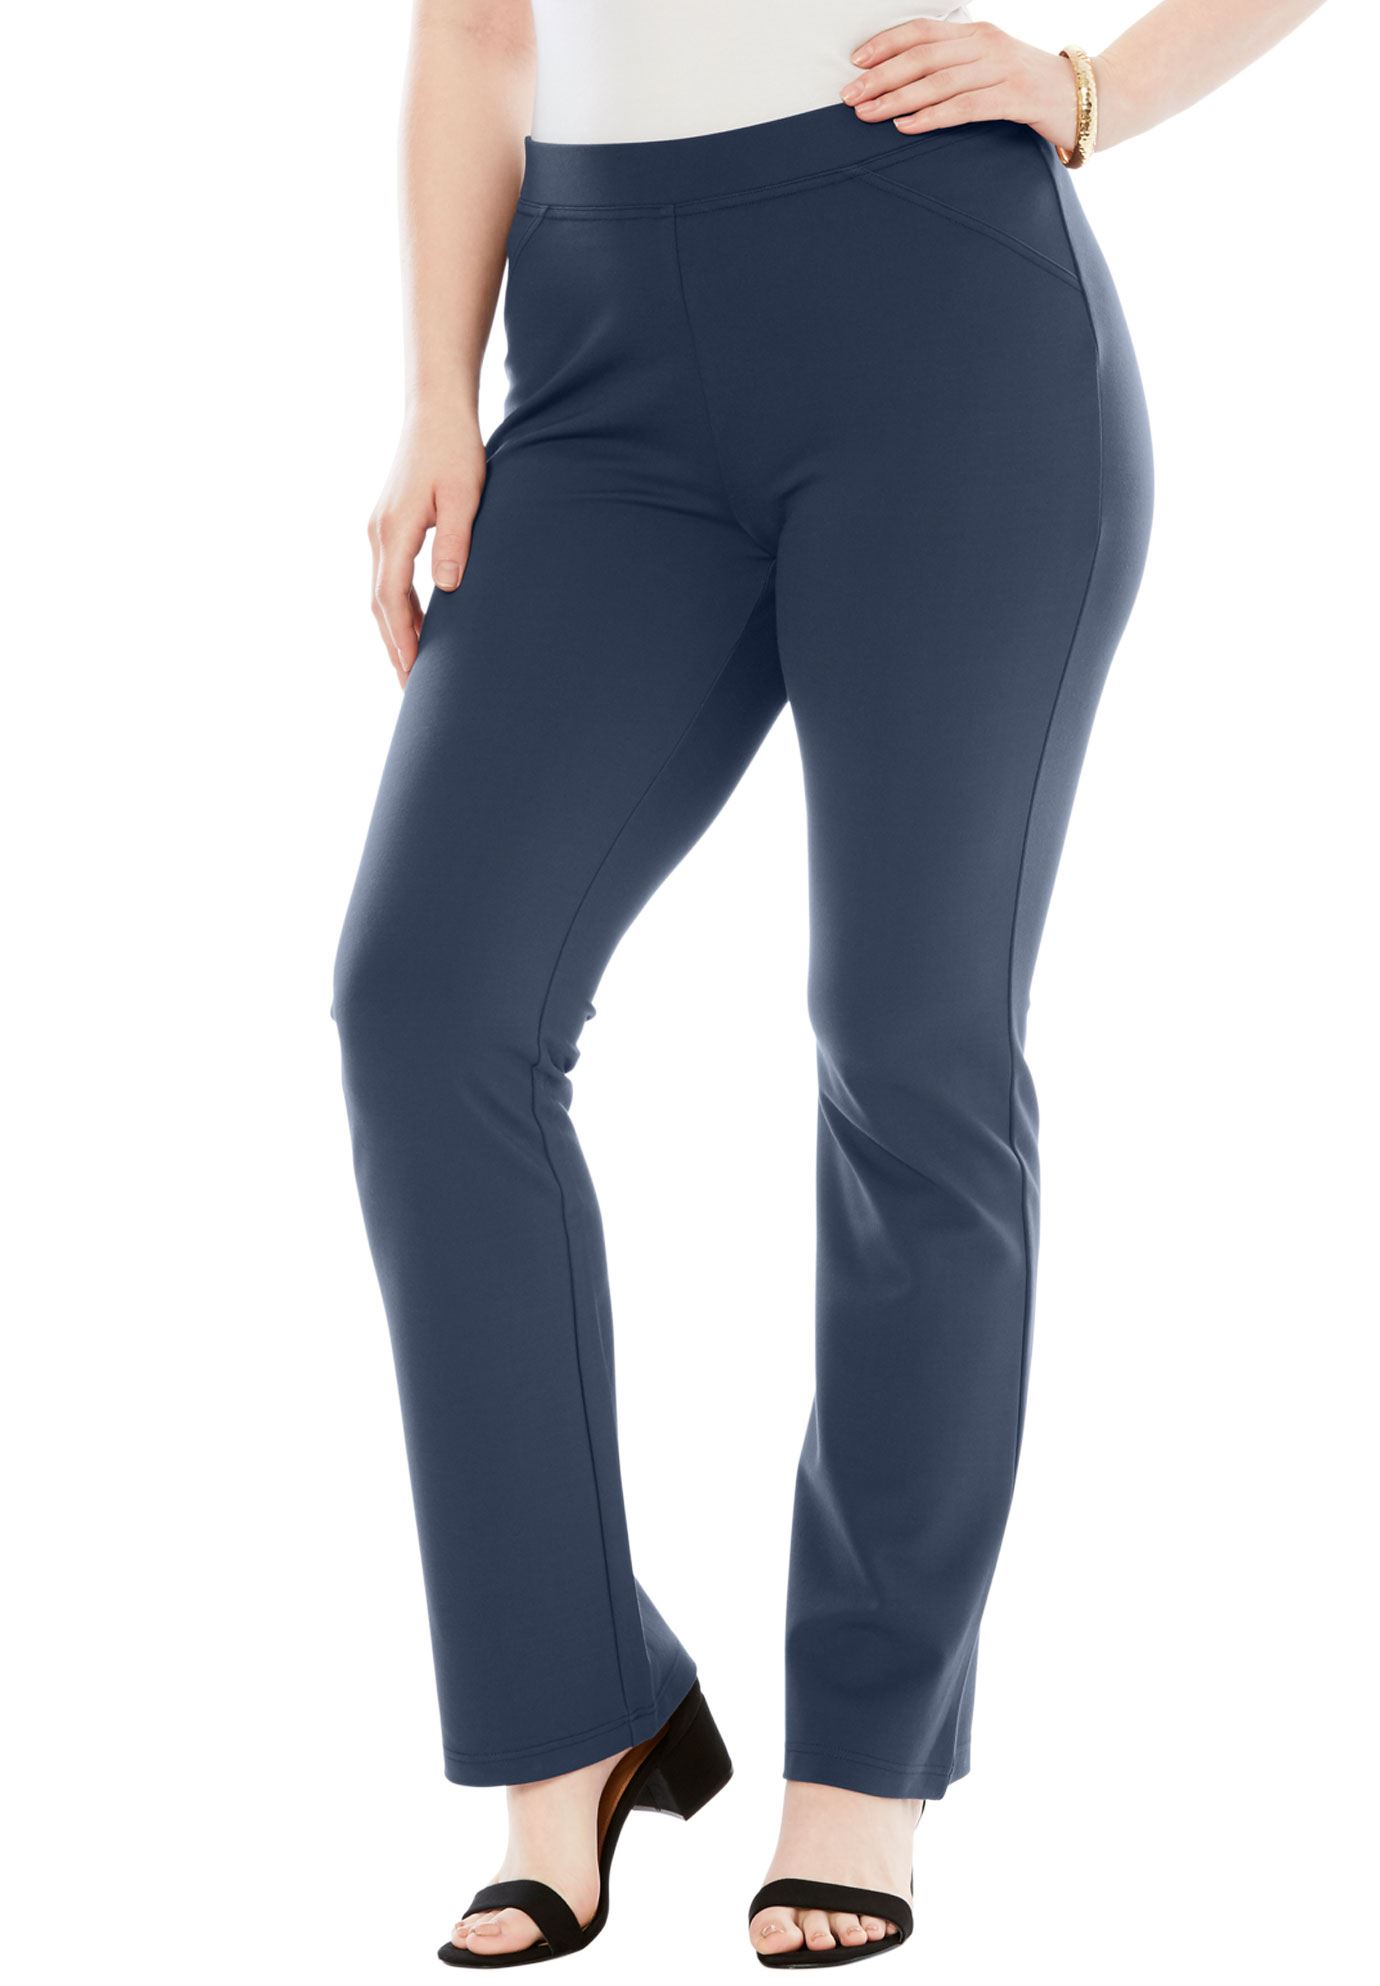 Roaman's Plus Size Ultimate Ponte Bootcut Pant